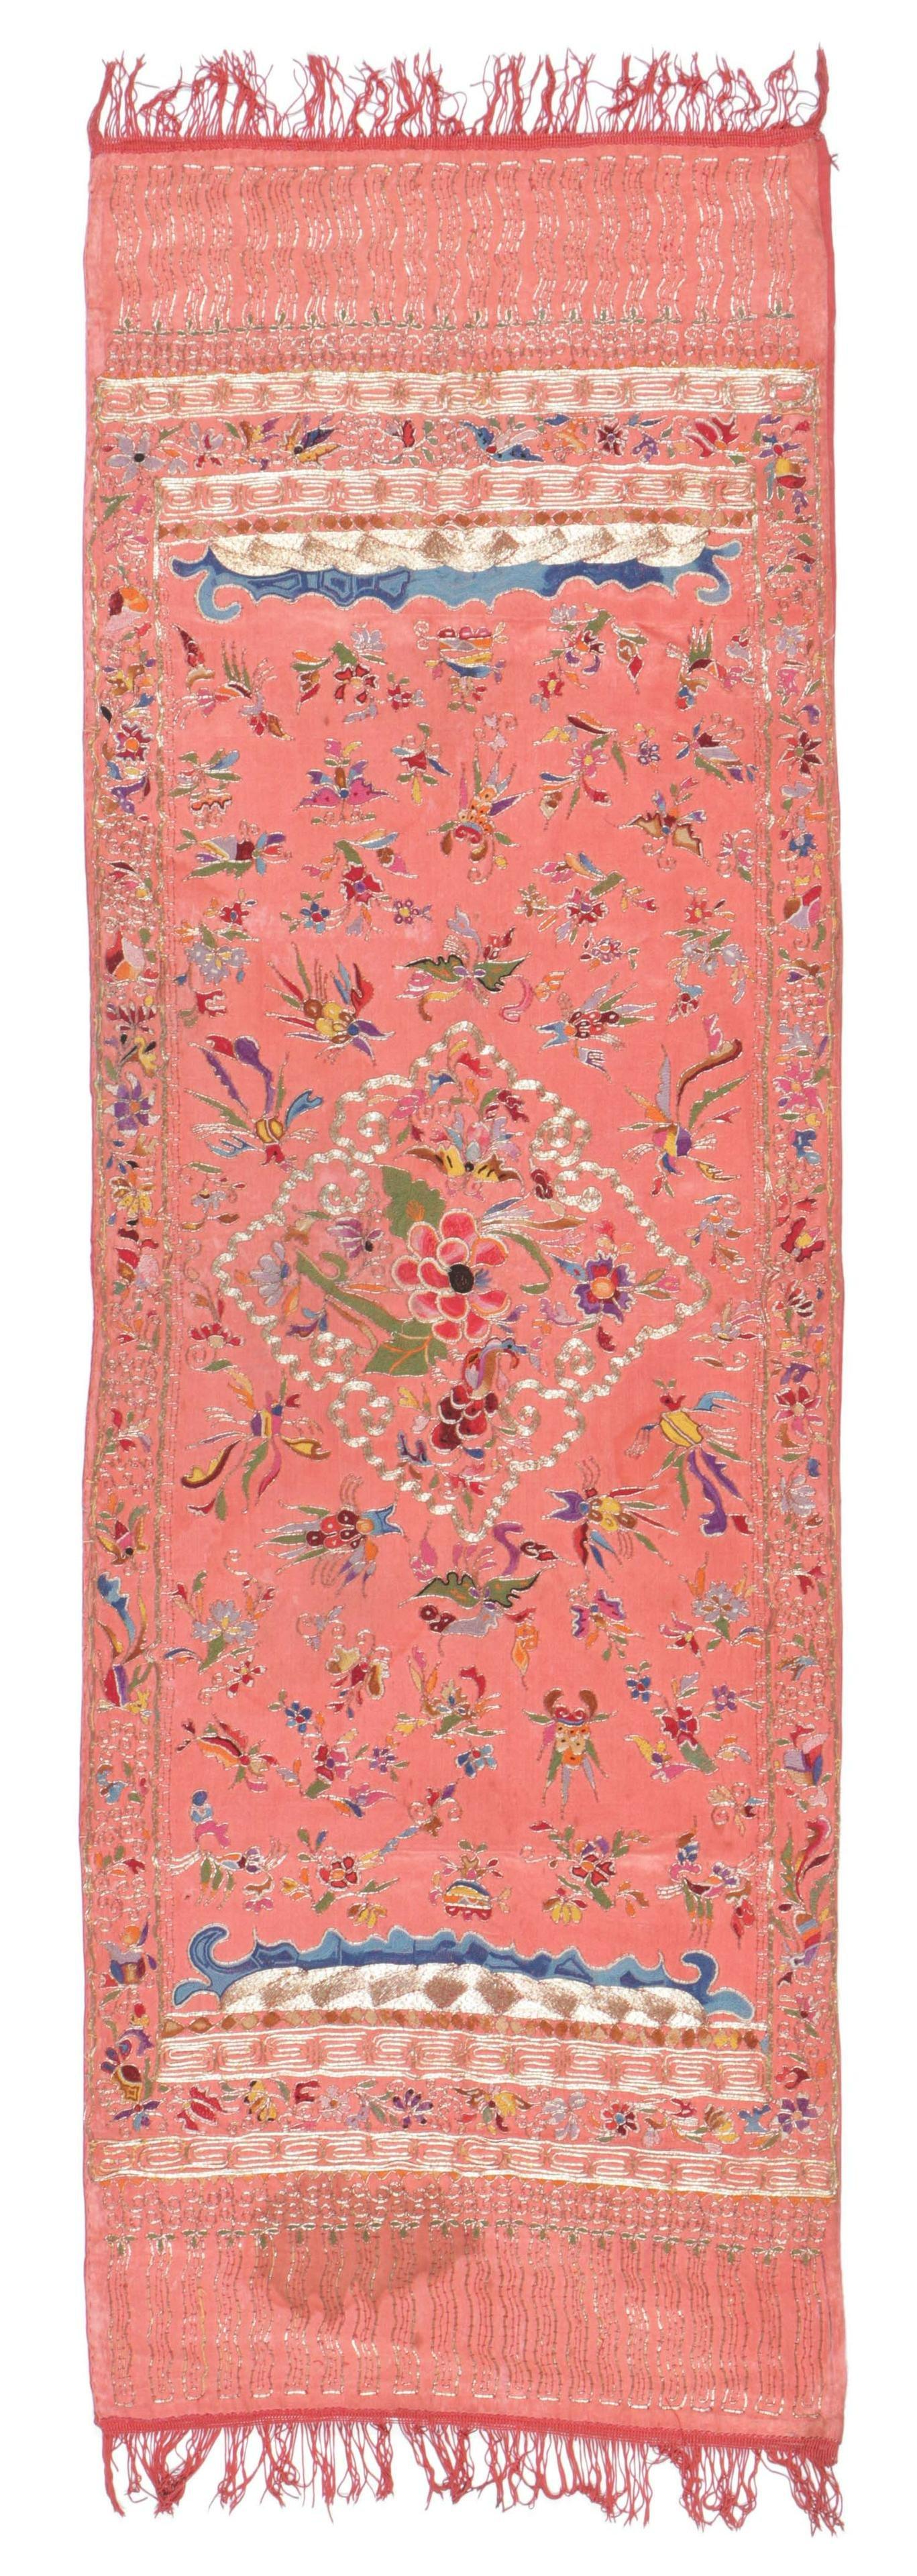 Exquisite Silk Embroidered Textile, Chinese Sumatra